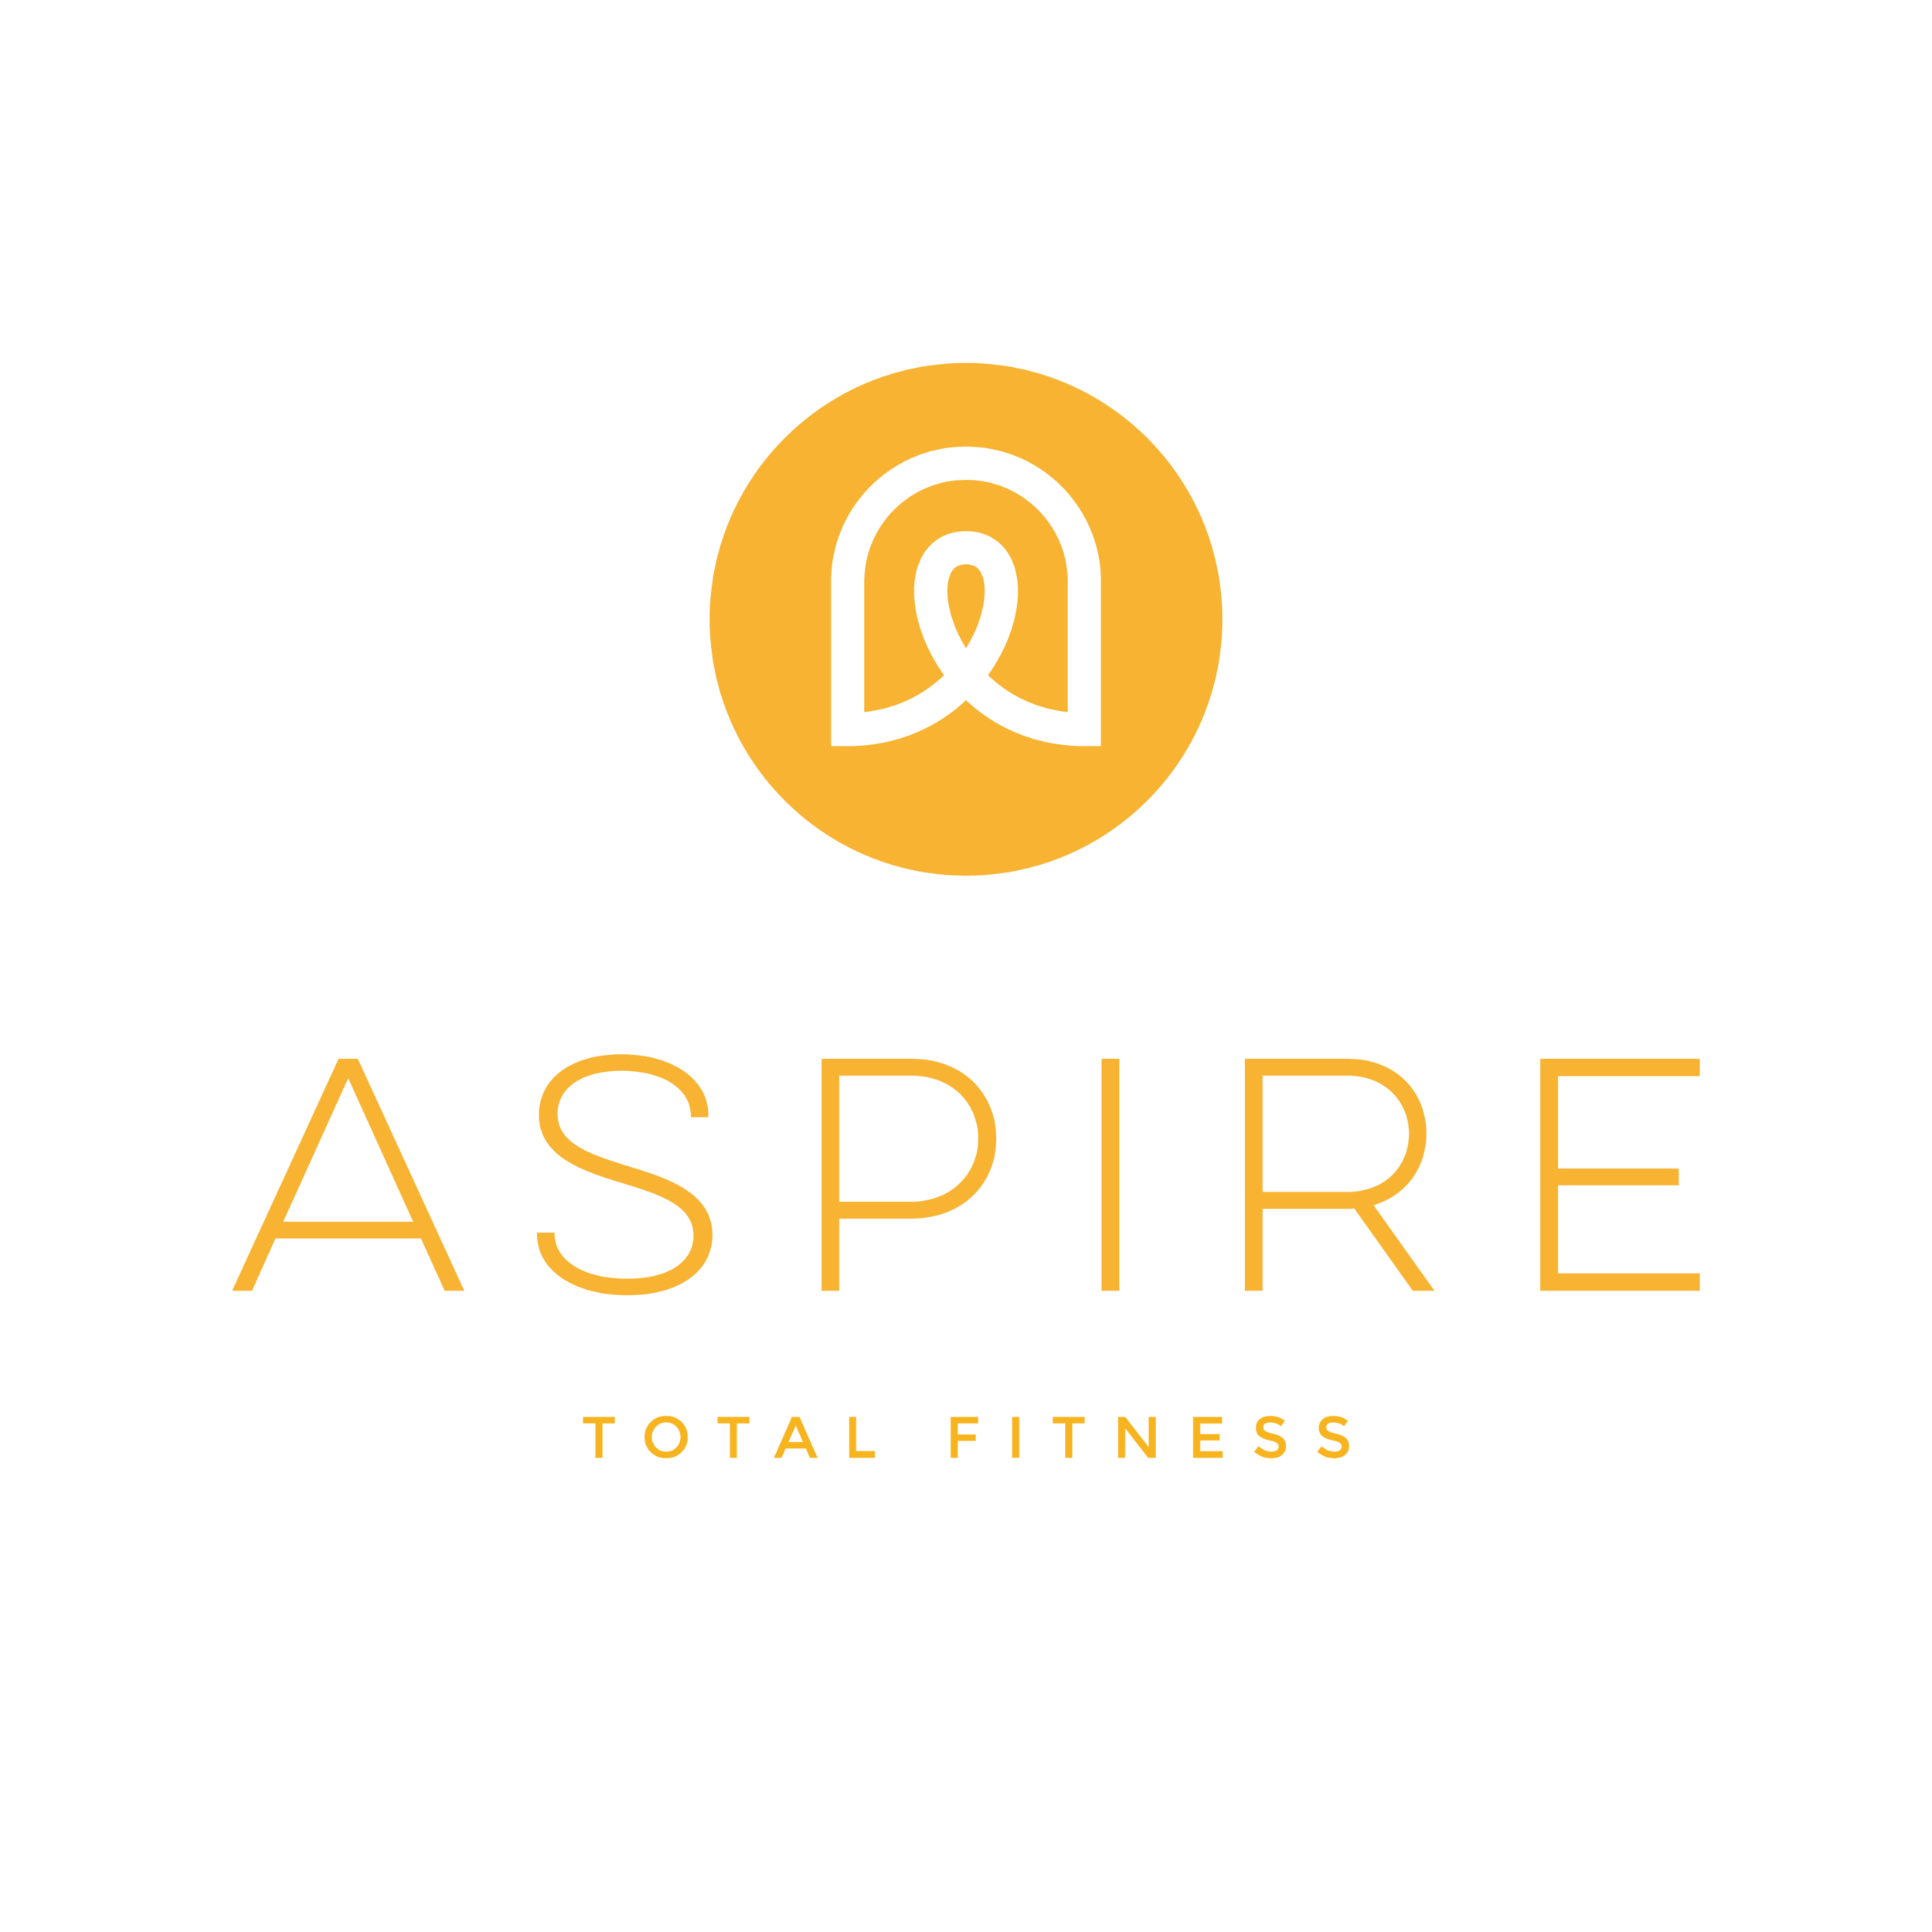 Finka_Studio_Aspire_Total_Fitness_Logo_Square.png